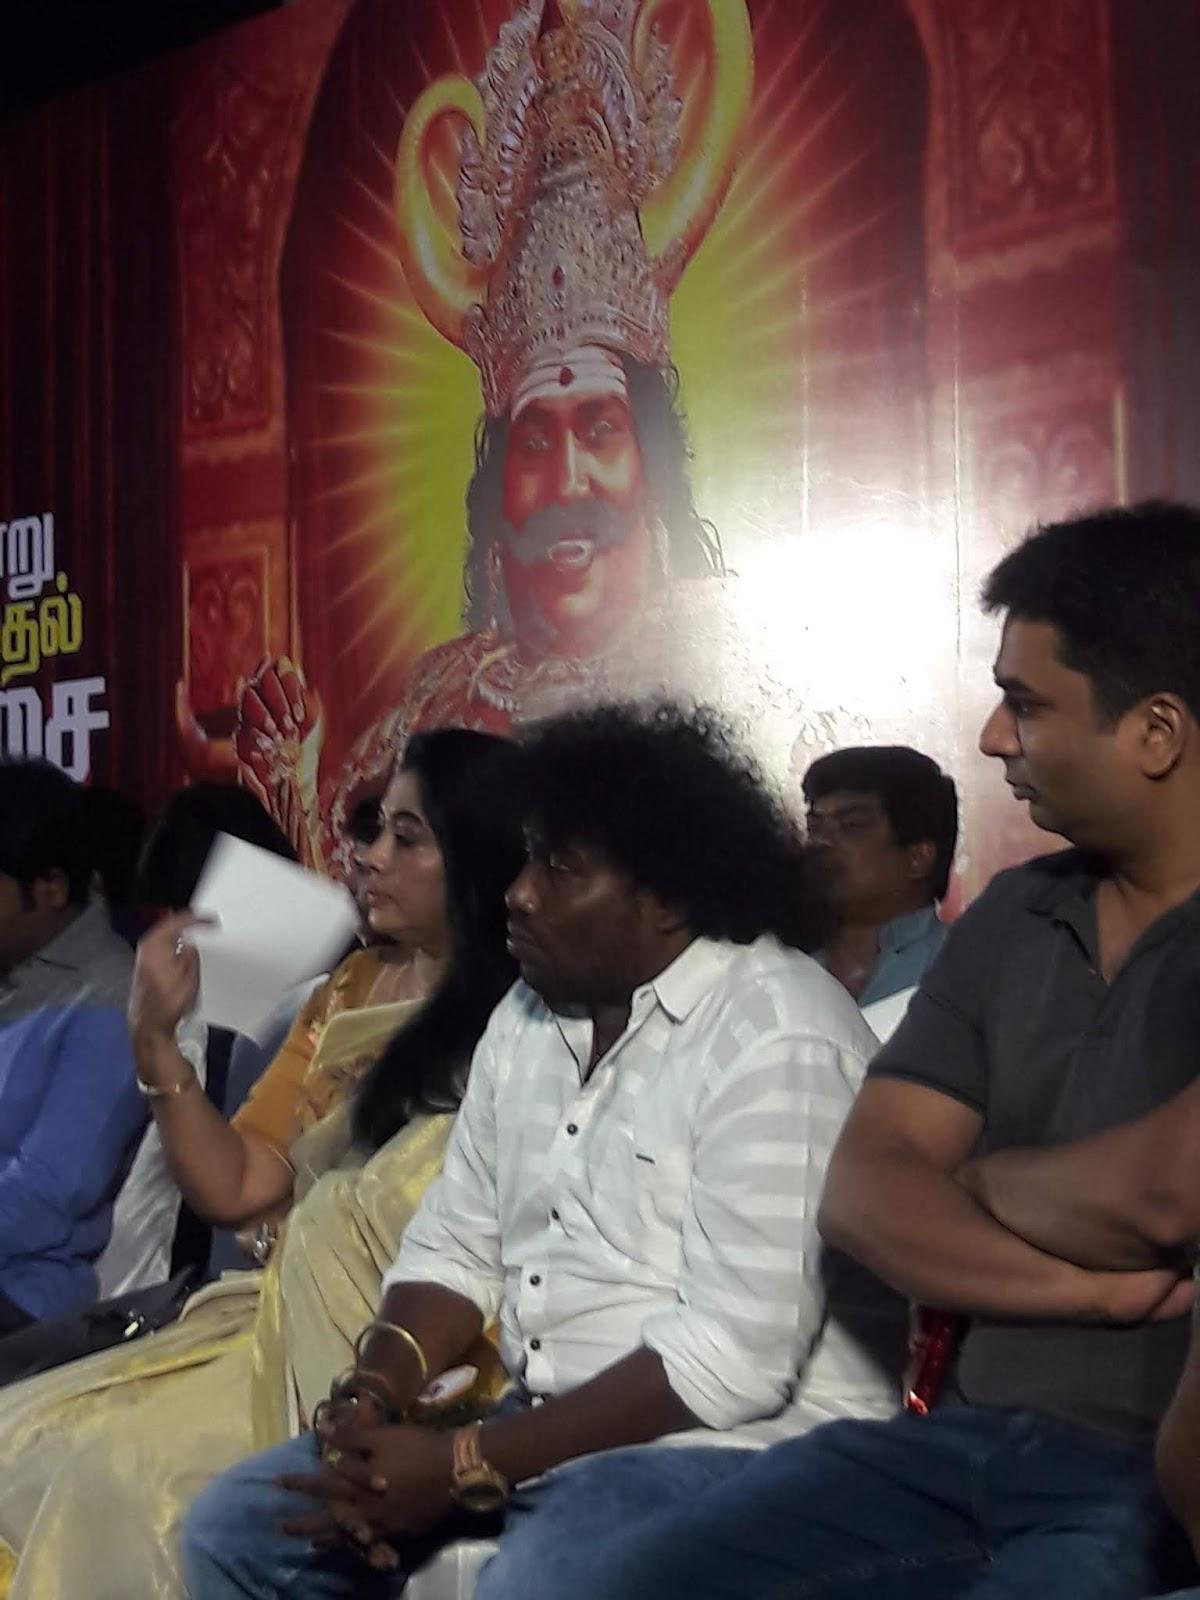 I have never demanded high remunarations -Yogi Babu